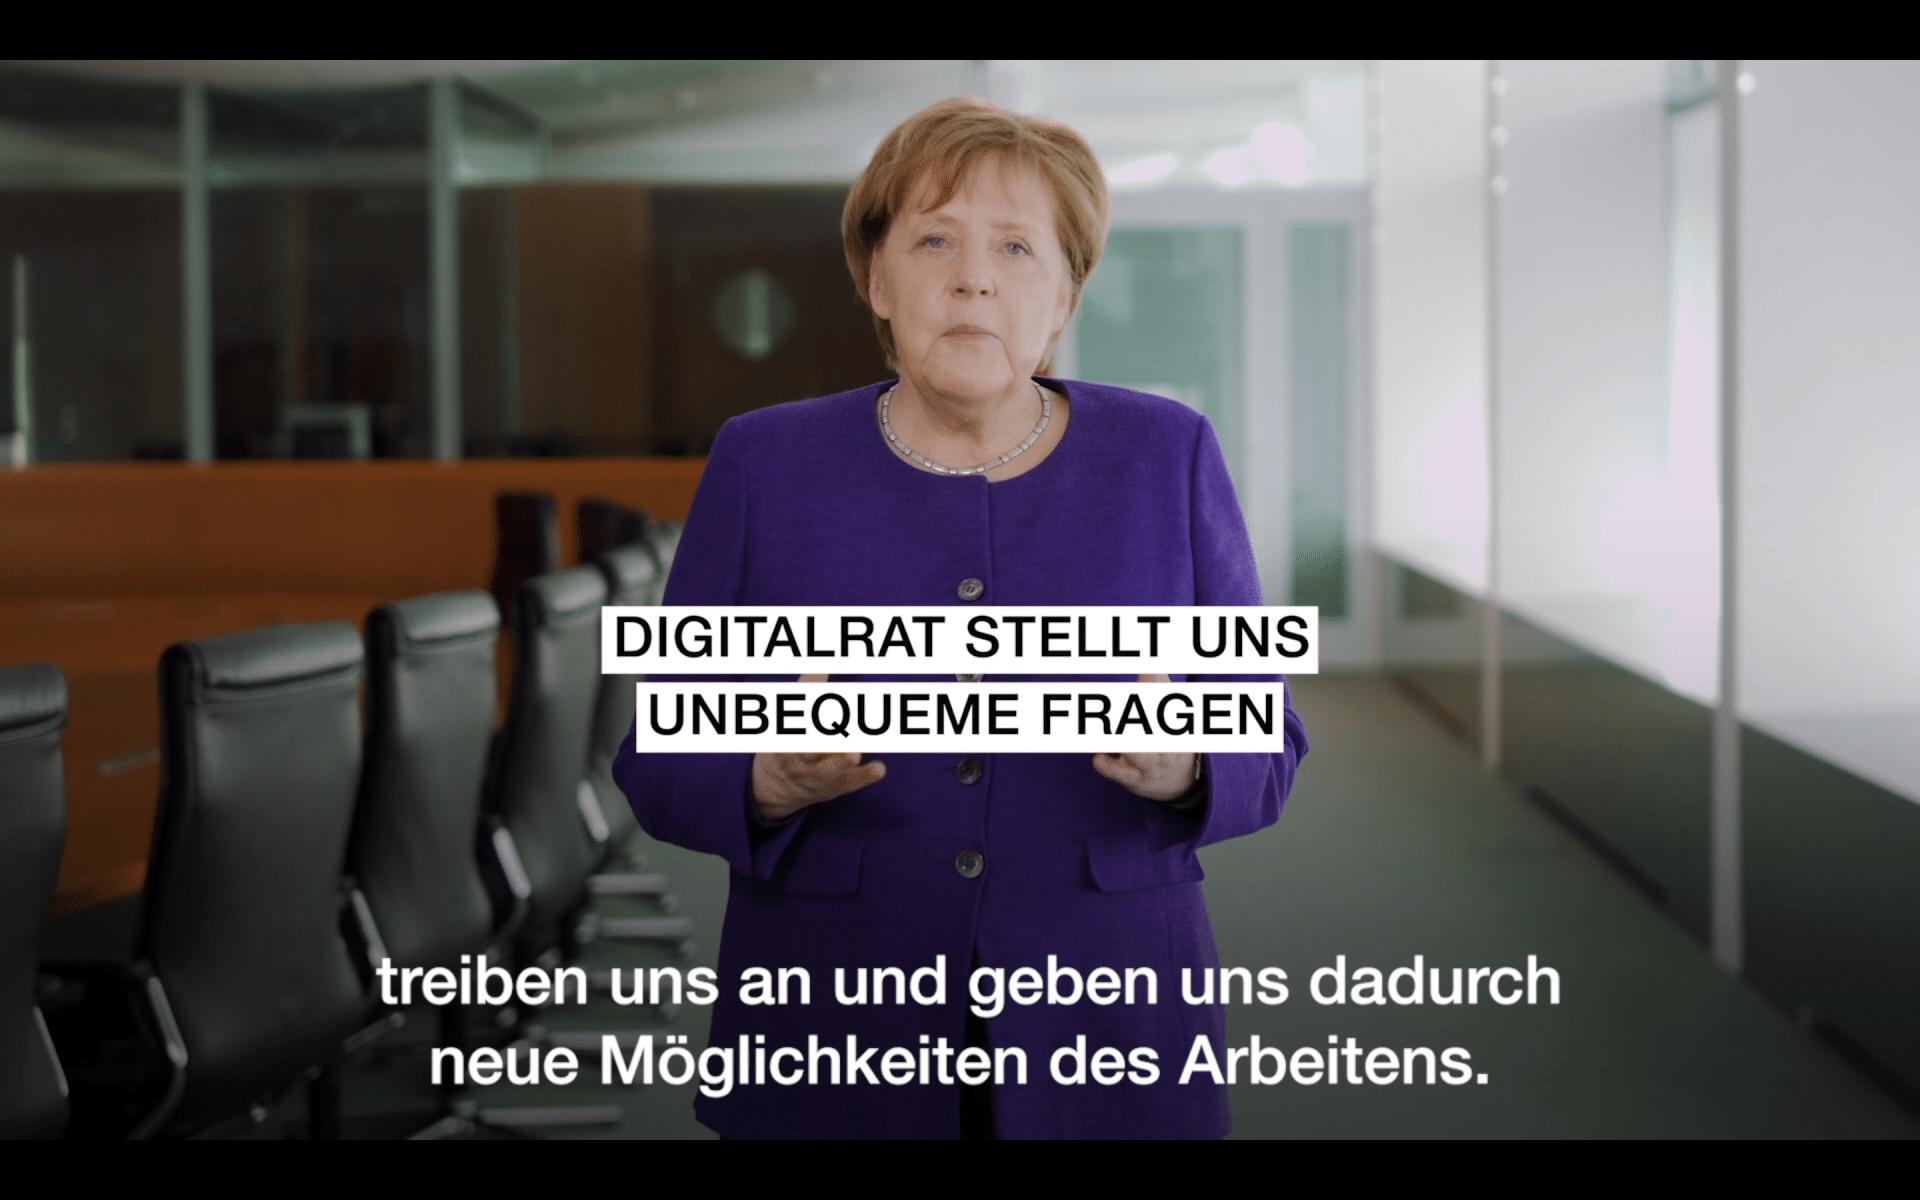 Merkel-ber-t-mit-Digitalrat-ber-Umgang-mit-Daten